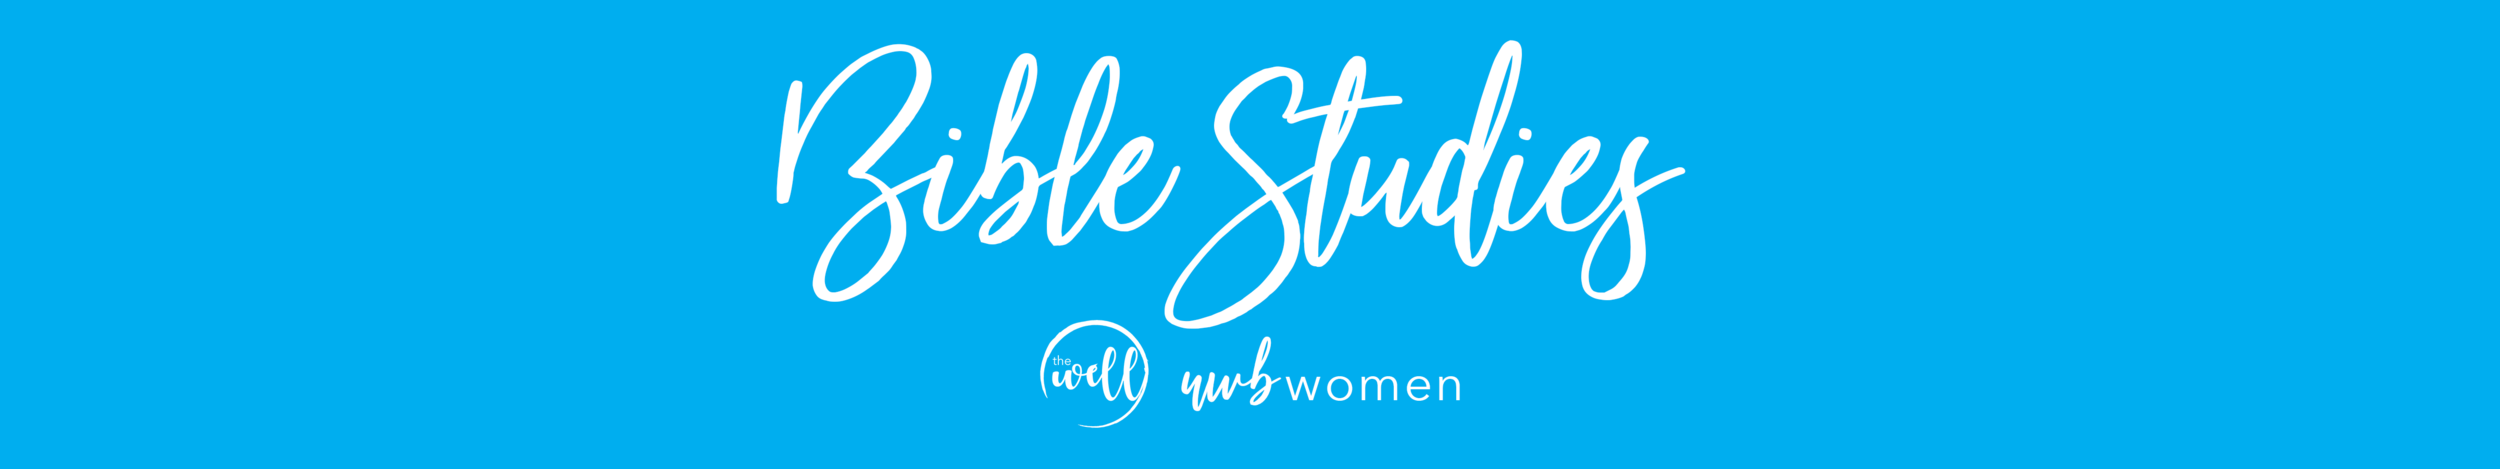 banner_women_biblestudies.png